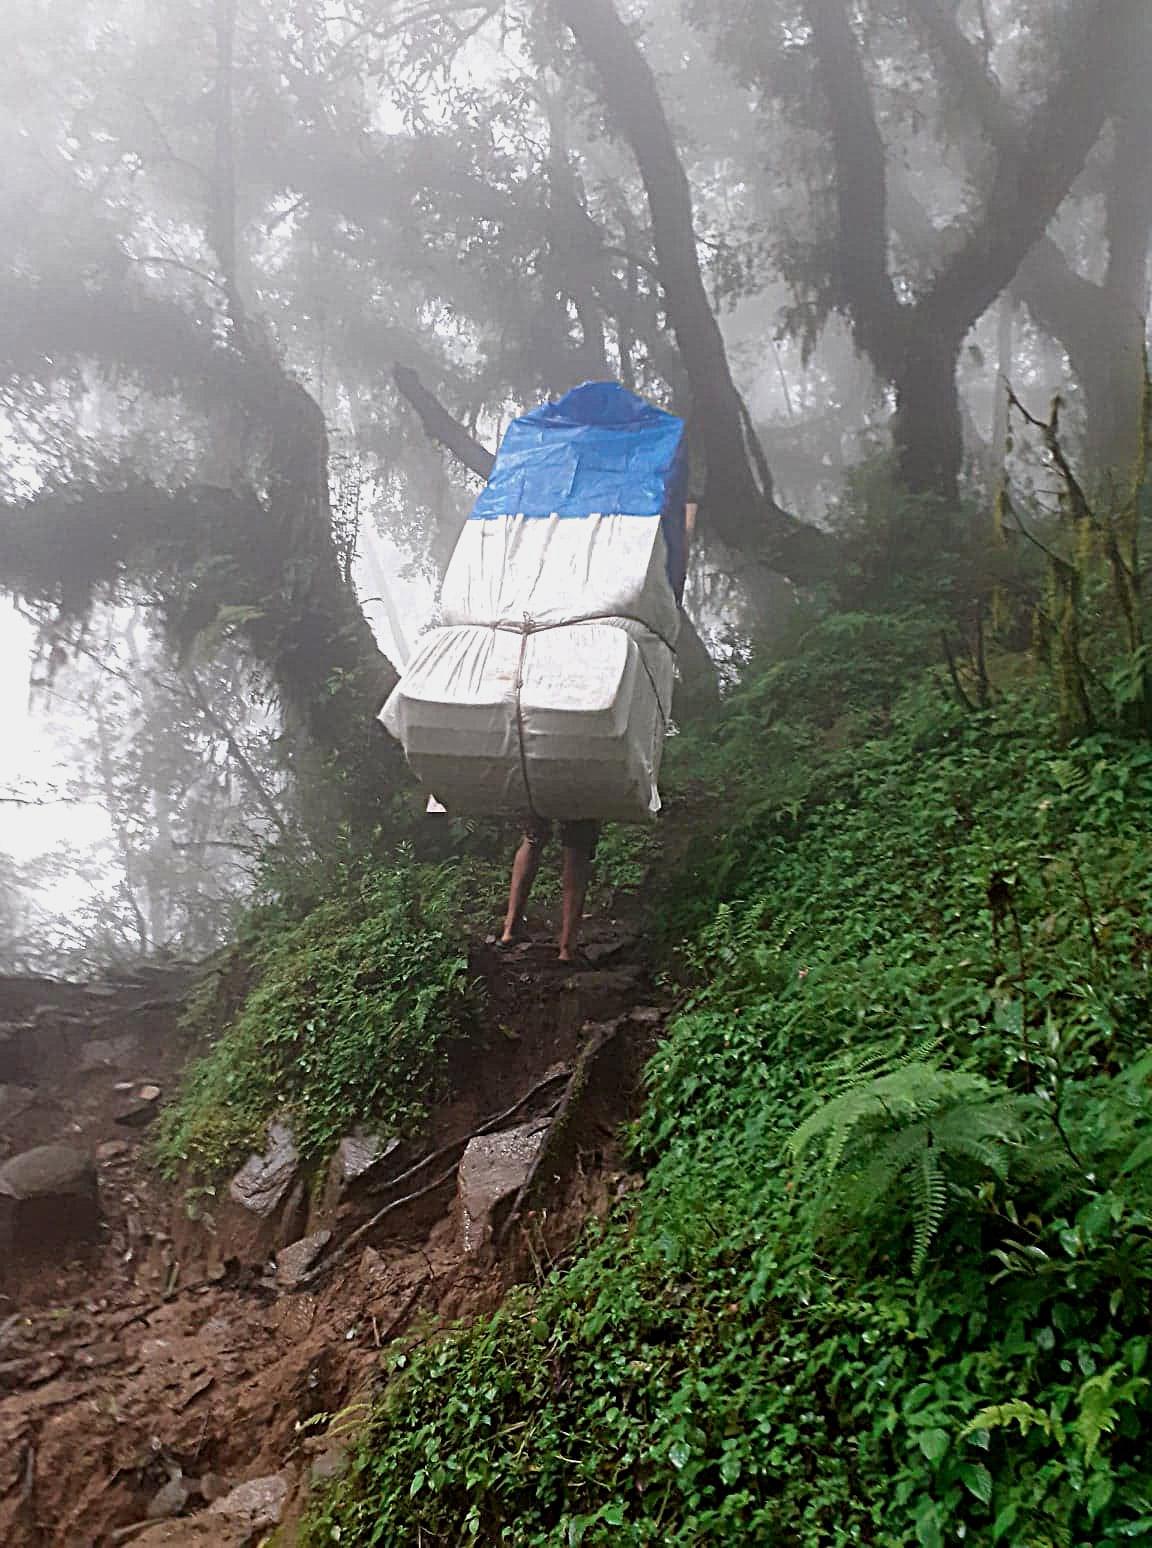 Sharpa carring a mattress  on a path